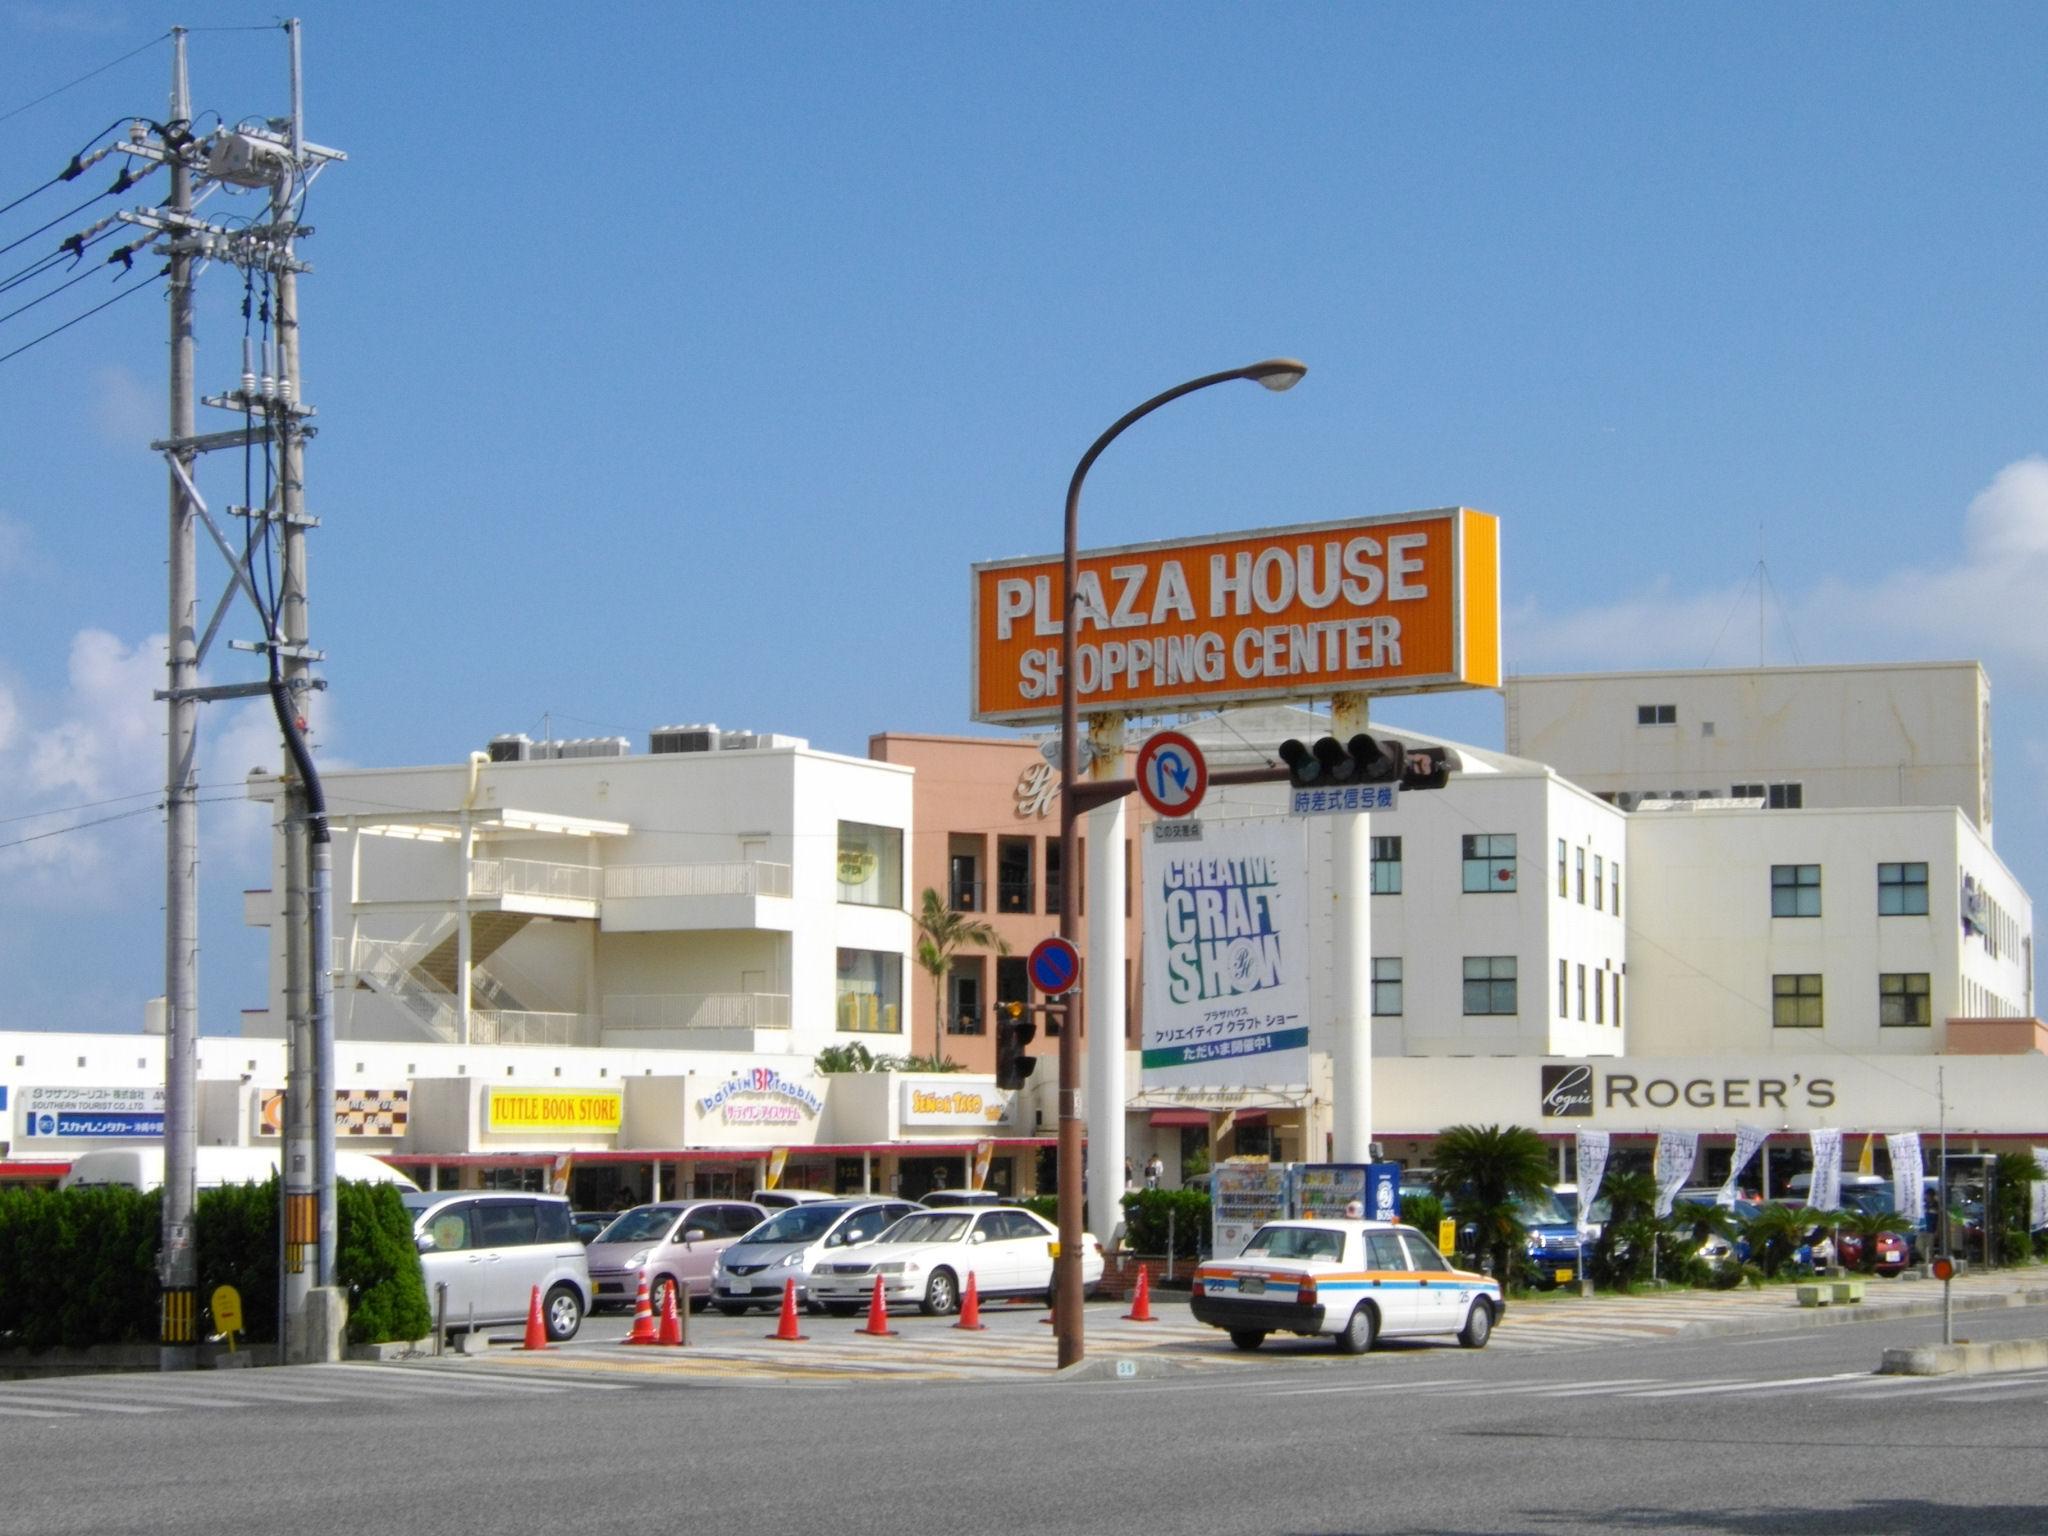 Plaza_House_Shopping_Center